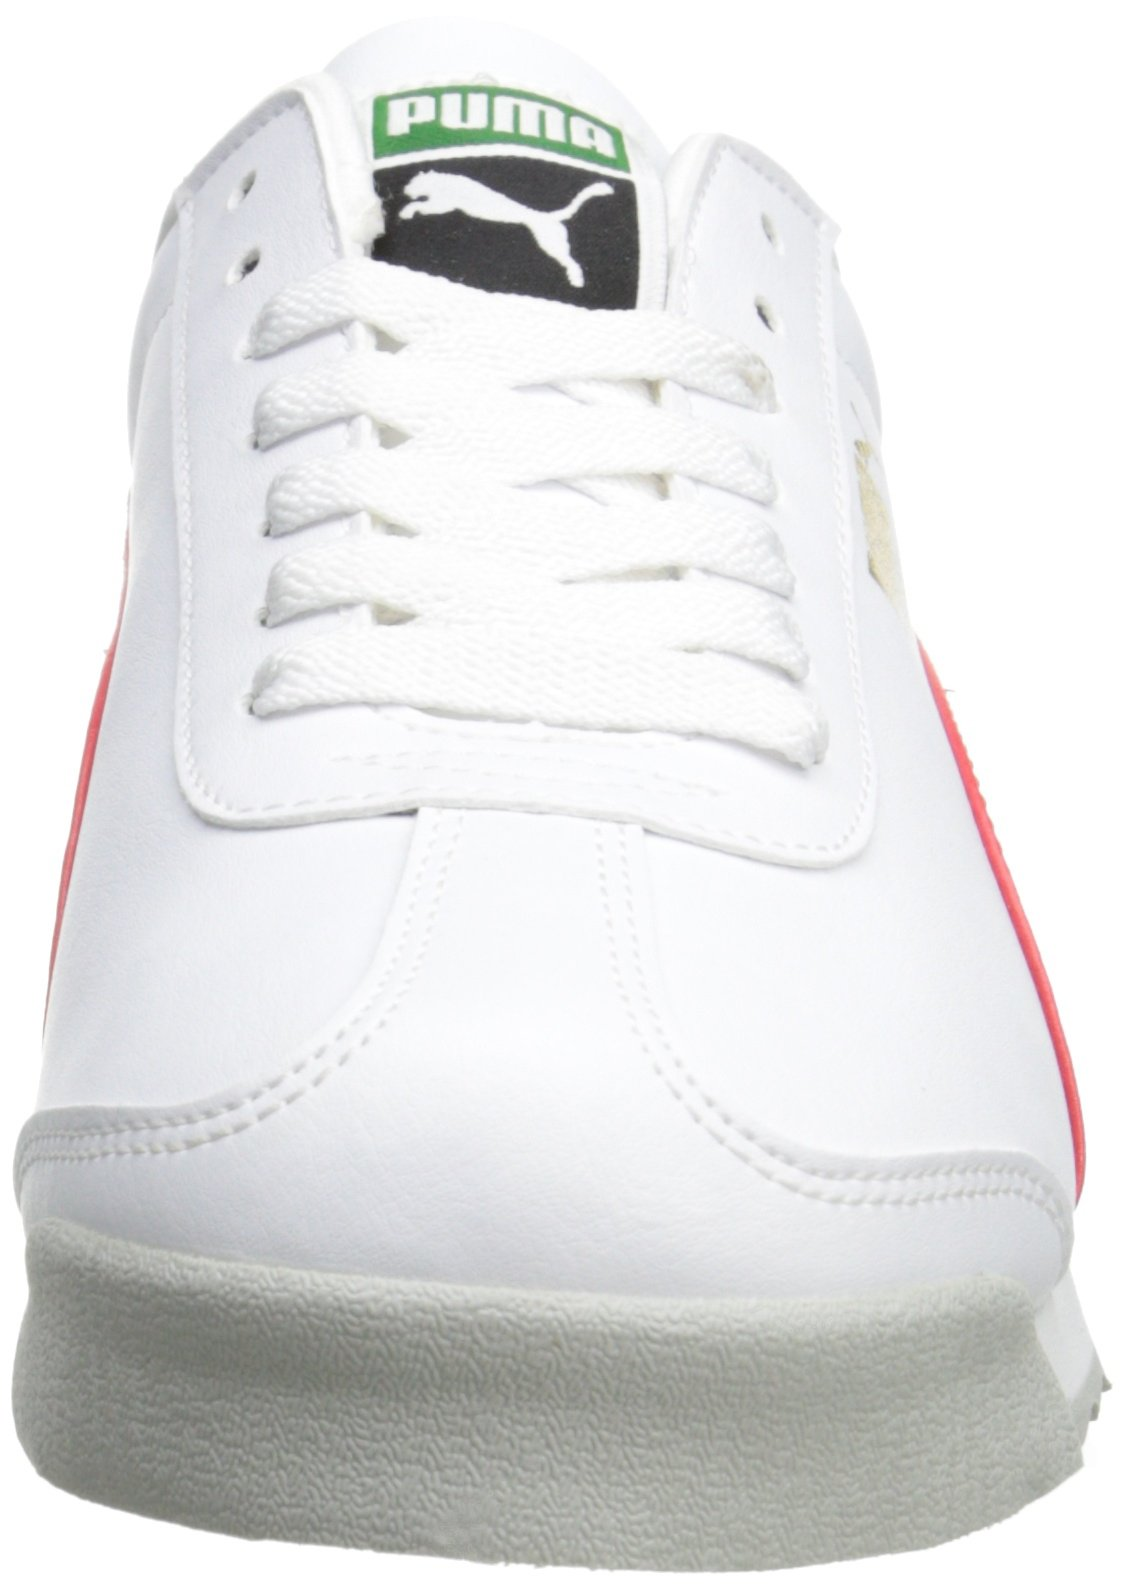 PUMA Men's Roma Basic Fashion Sneaker, White/High Risk Red/White - 9 D(M) US by PUMA (Image #4)